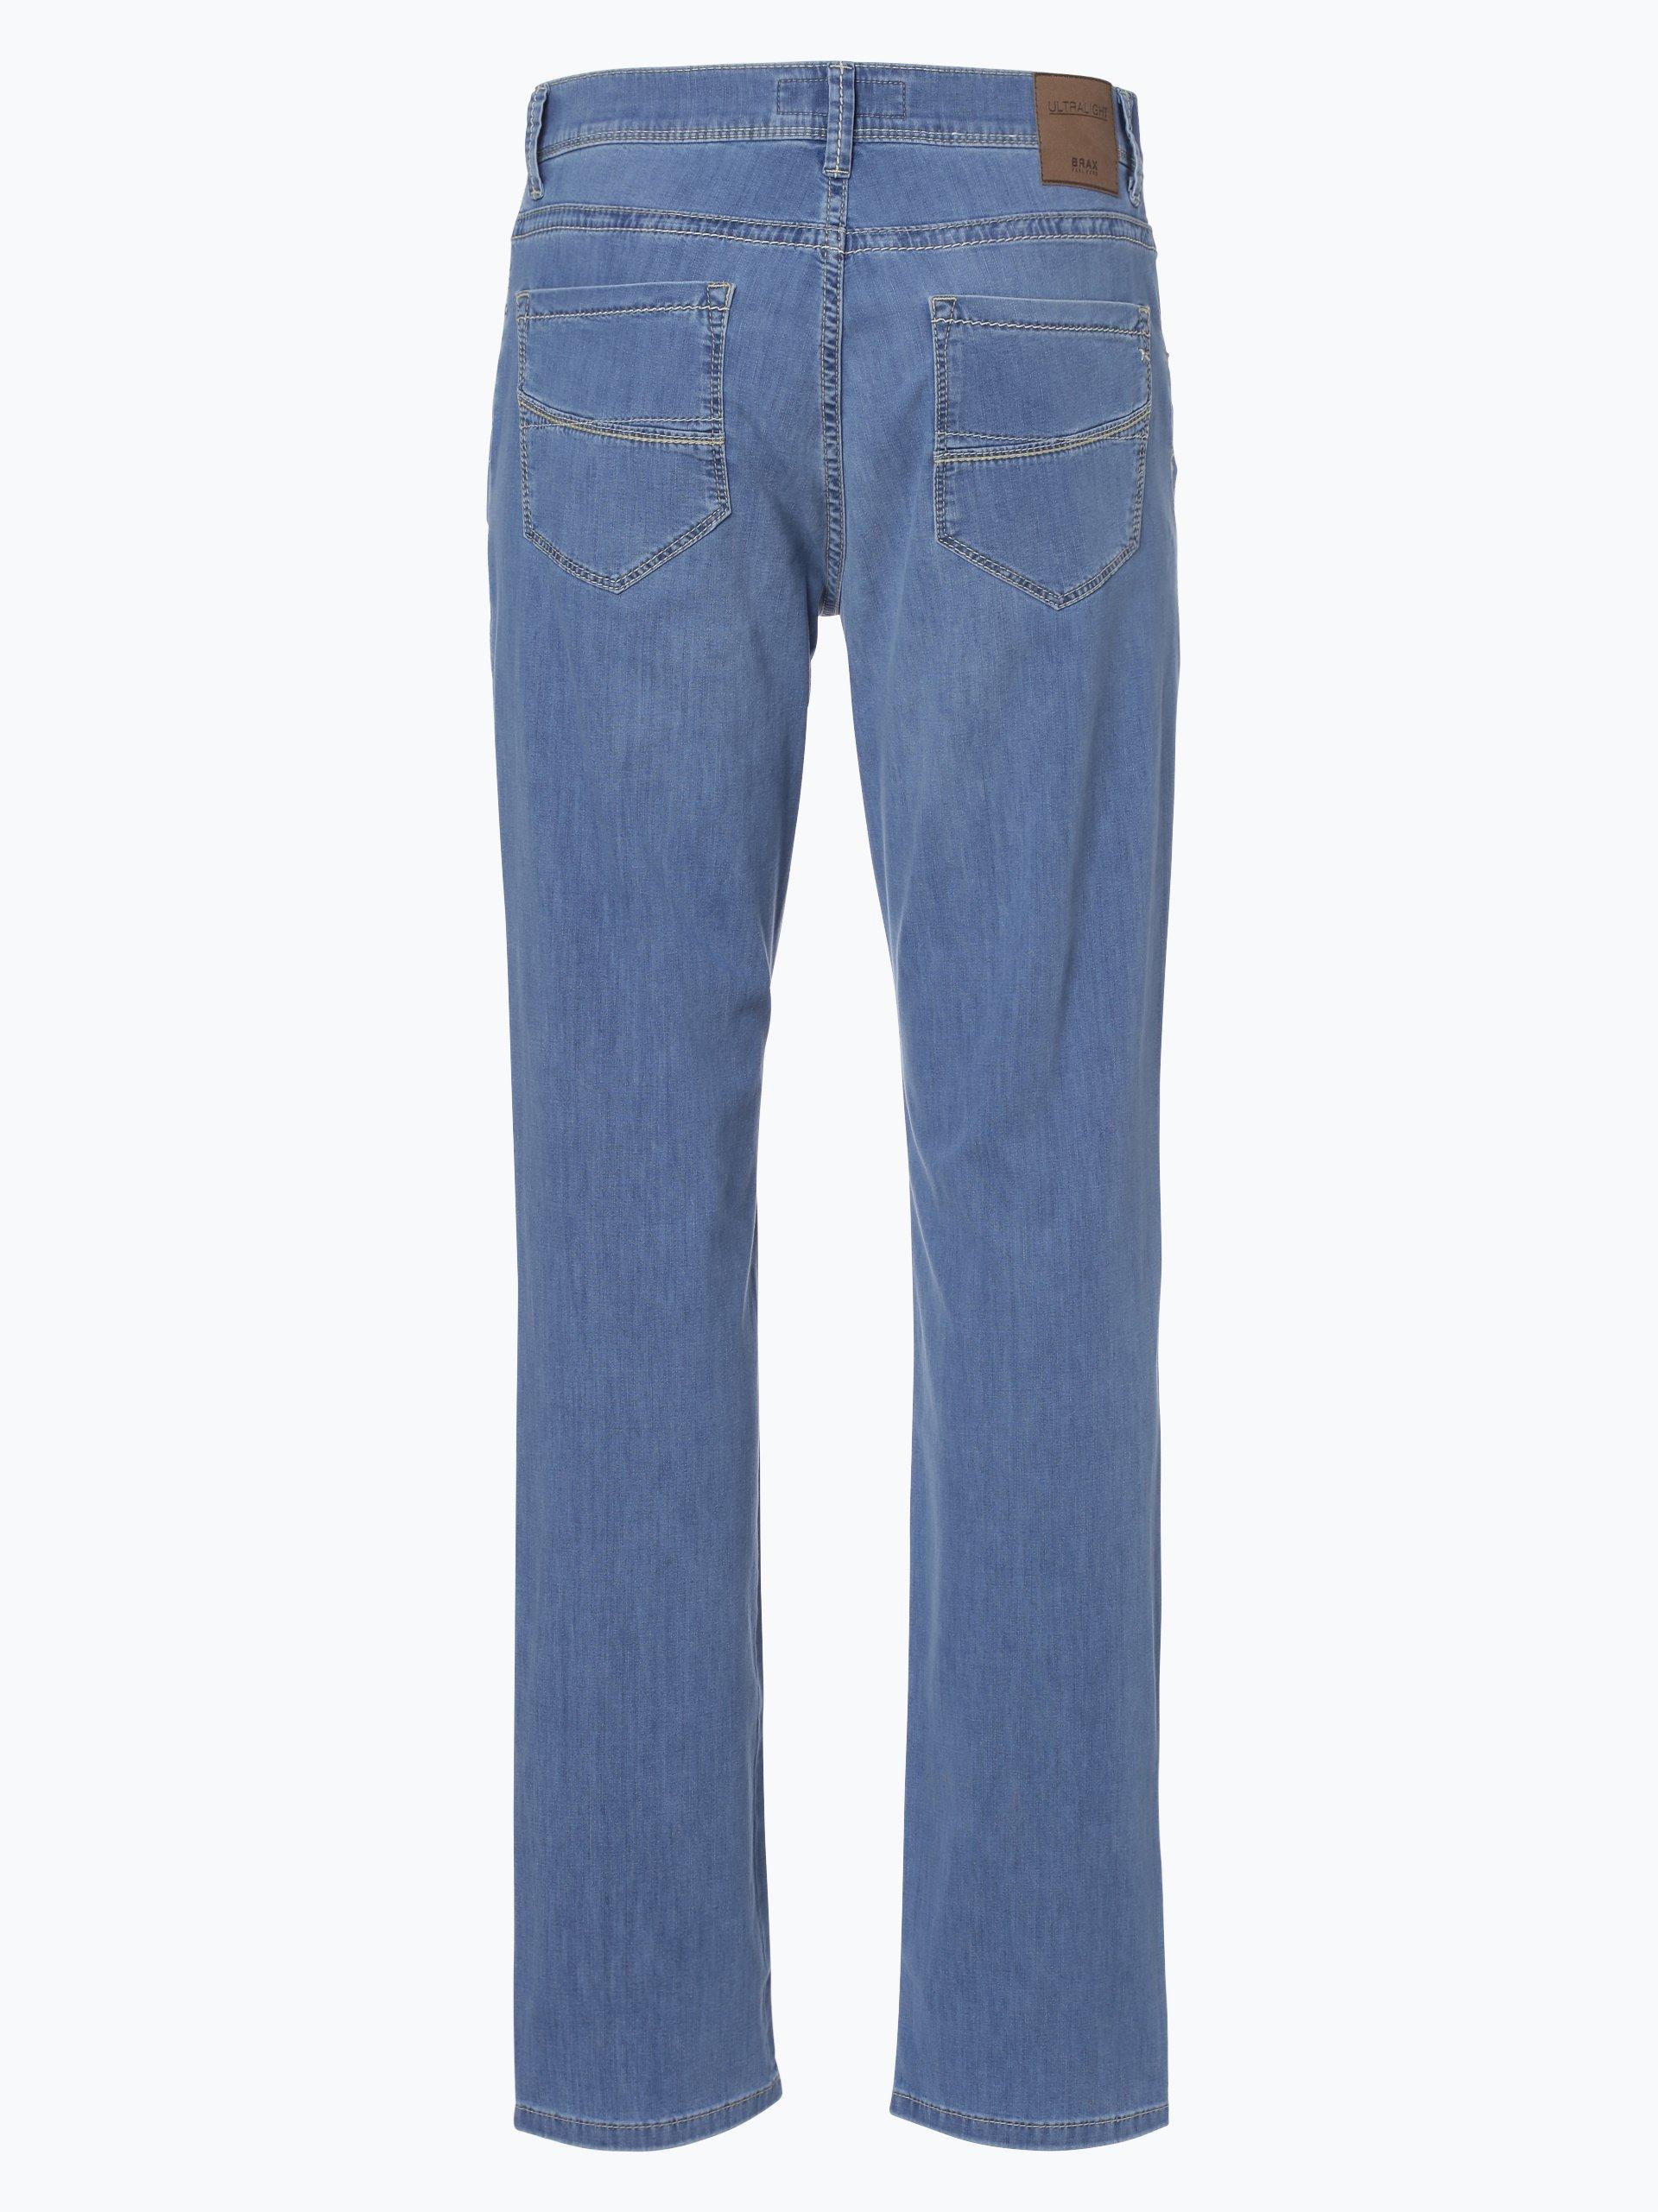 brax herren jeans cadiz bleached uni online kaufen. Black Bedroom Furniture Sets. Home Design Ideas